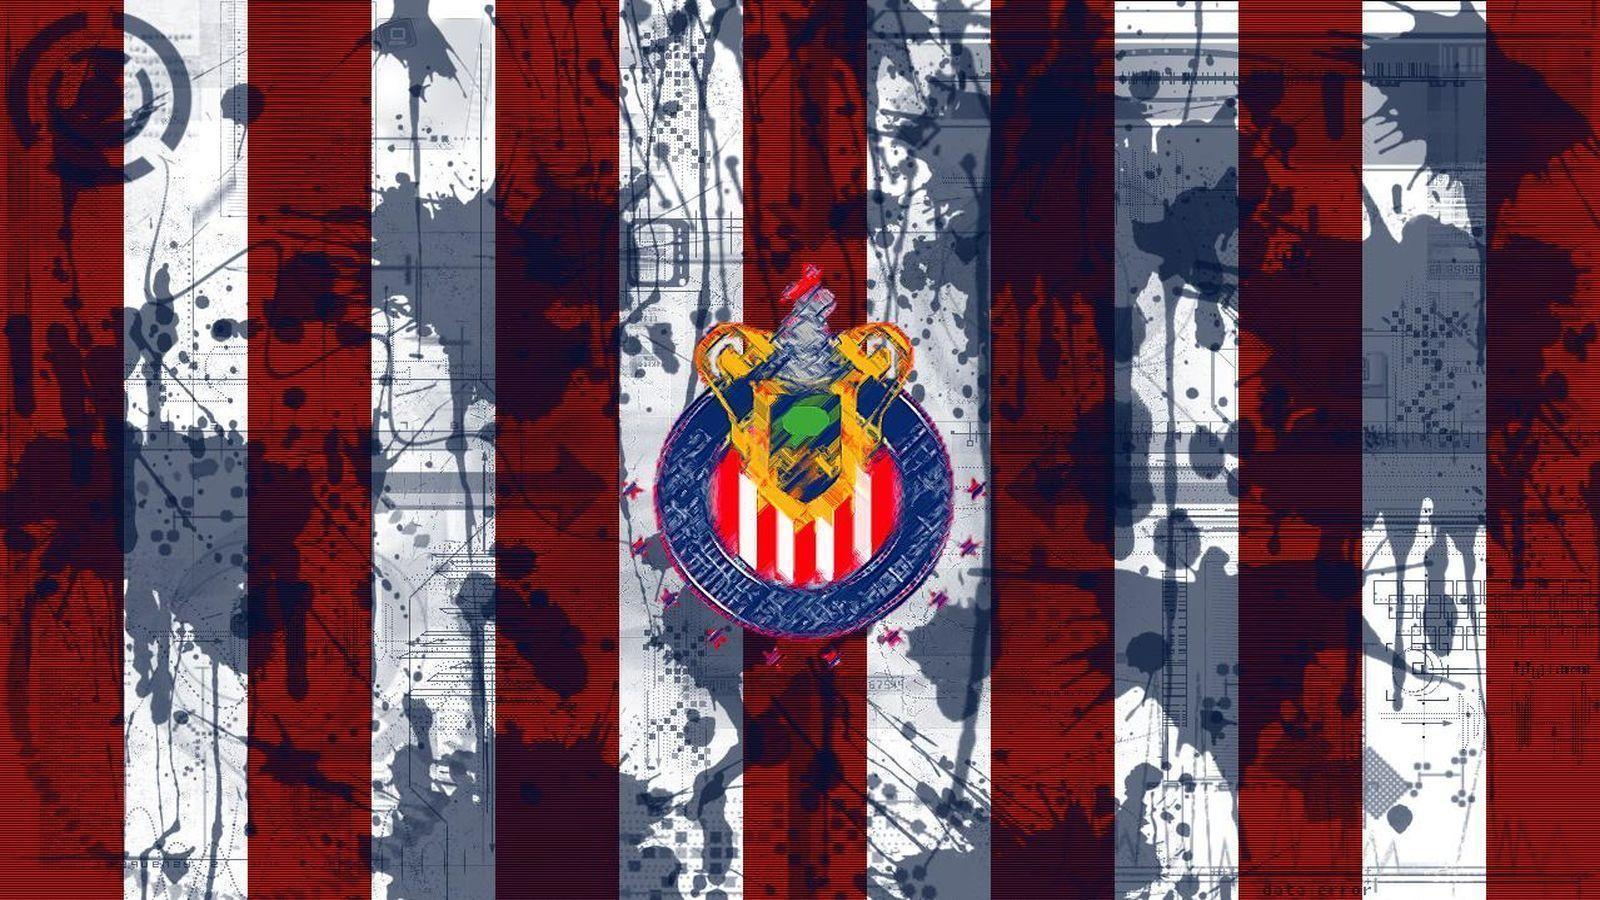 Chivas Wallpaper Hd Chivas Wallpapers 2015 Wallpaper Cave